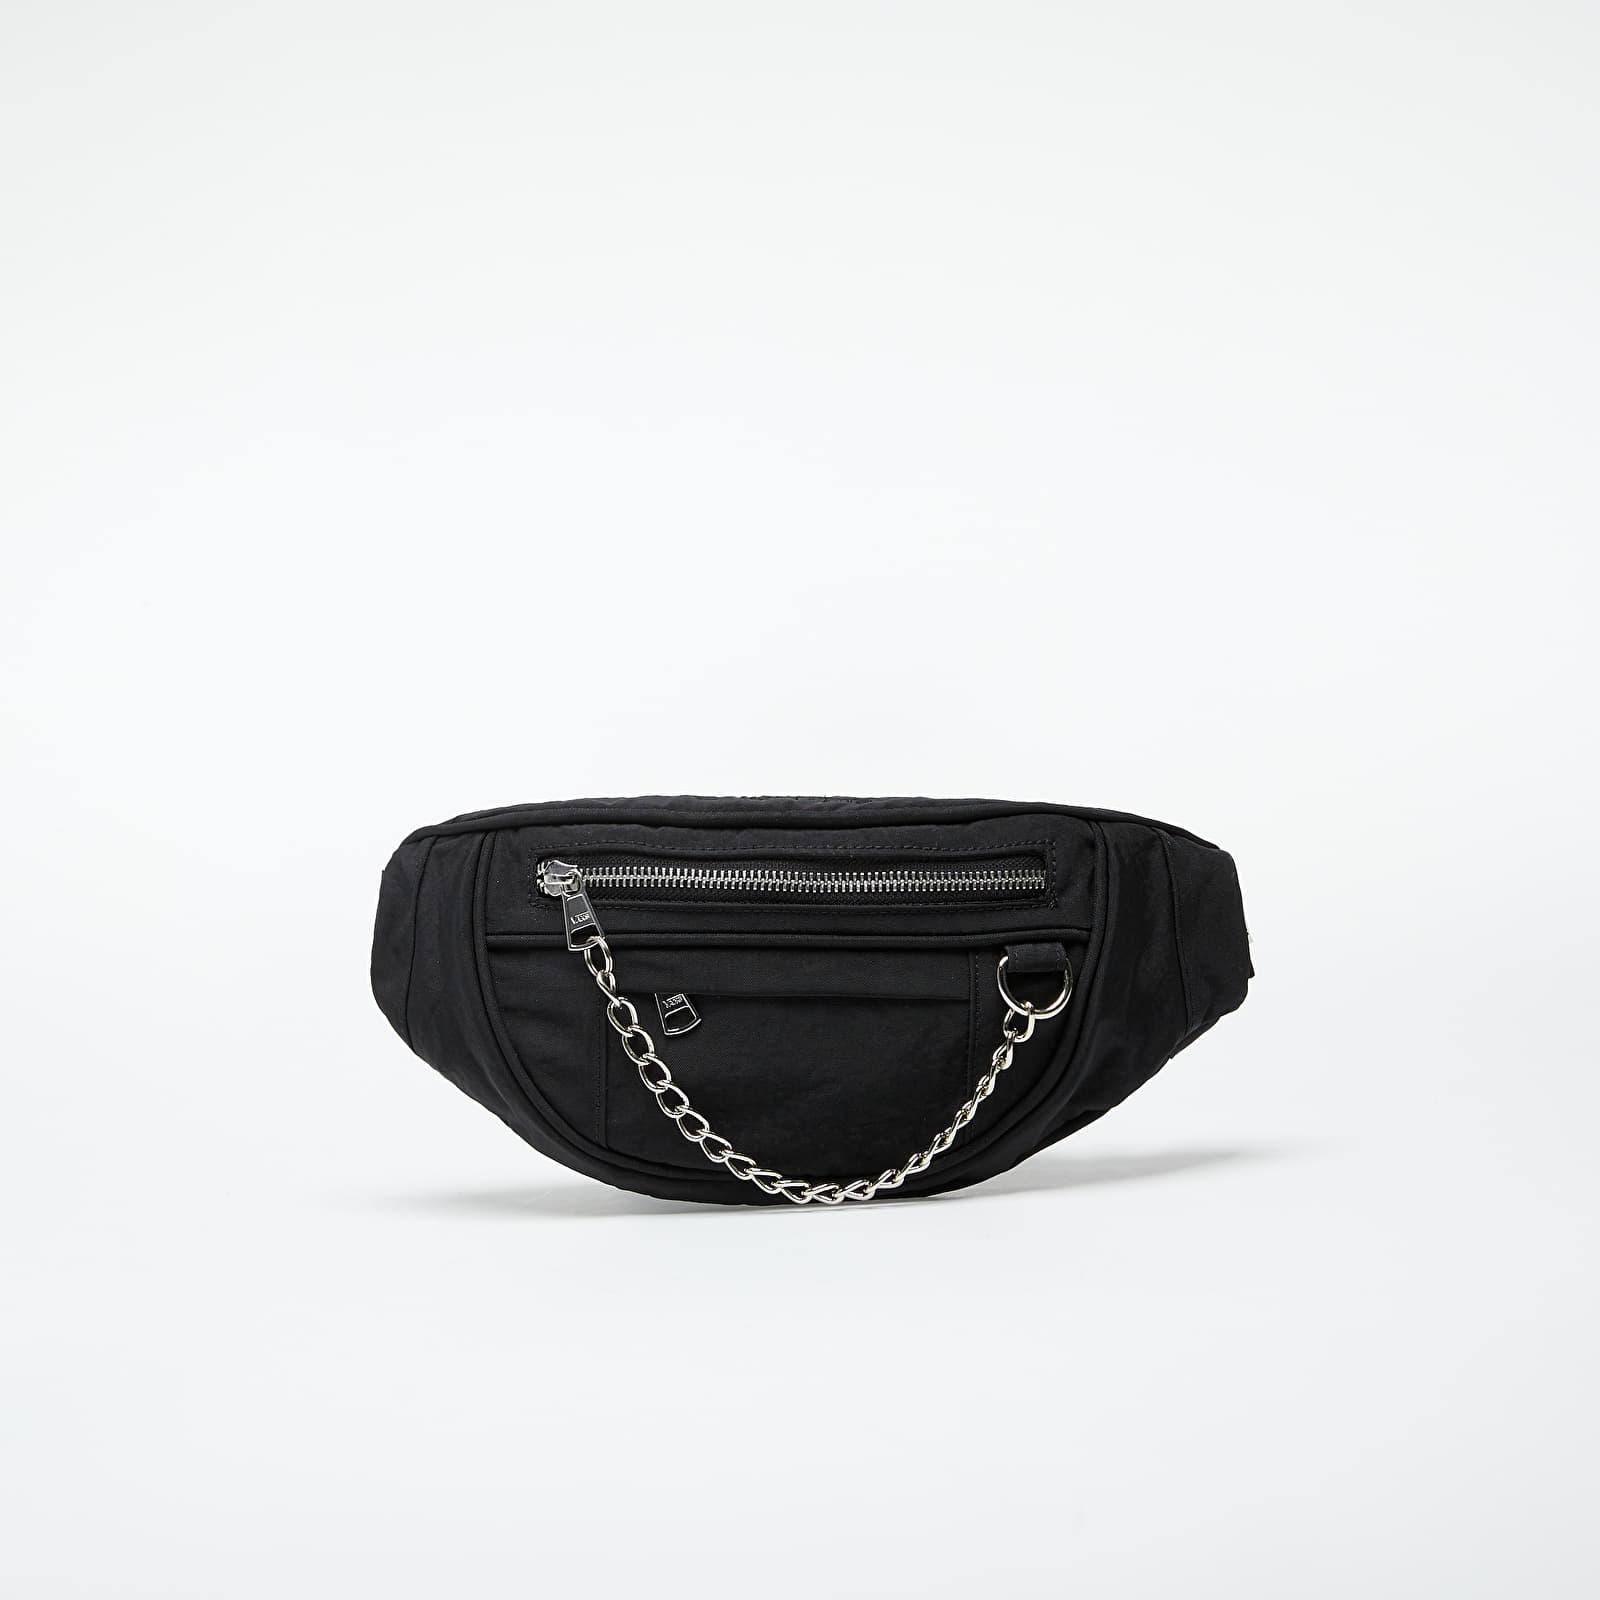 Waist bags Vans x Sandy Liang Fanny Pack Black